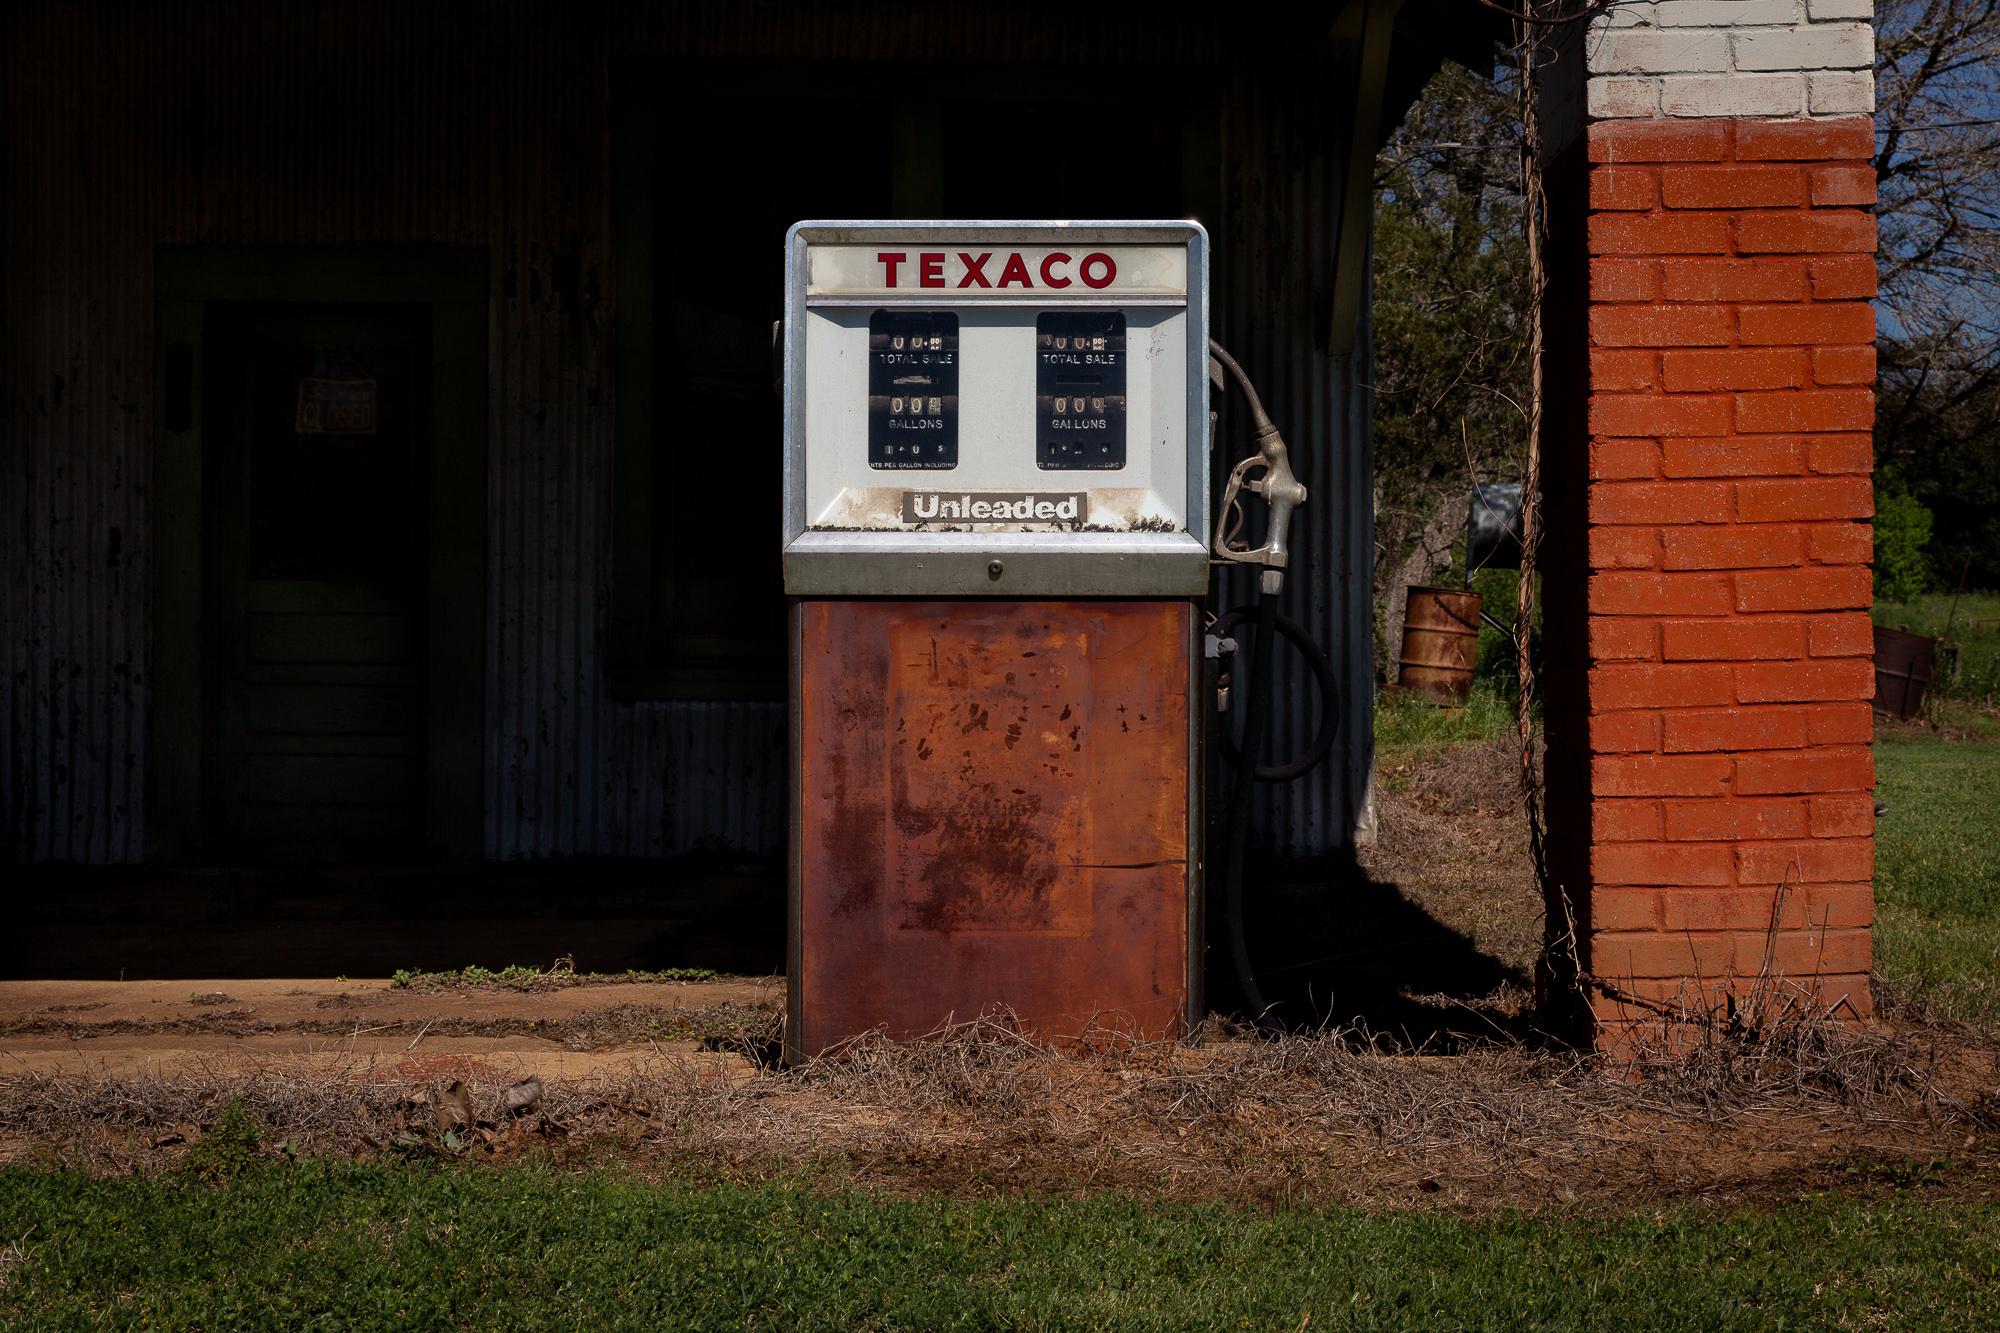 An old Texaco gas pump in Leona, TX